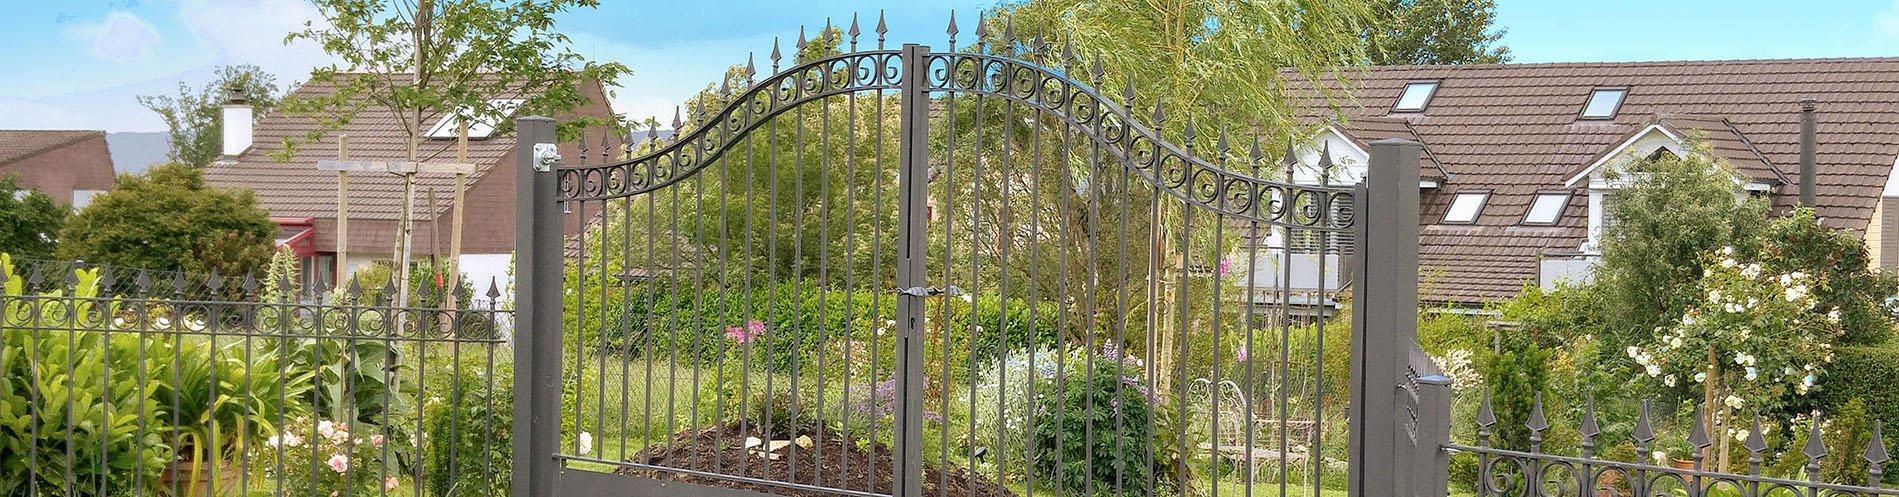 Gartentor antik